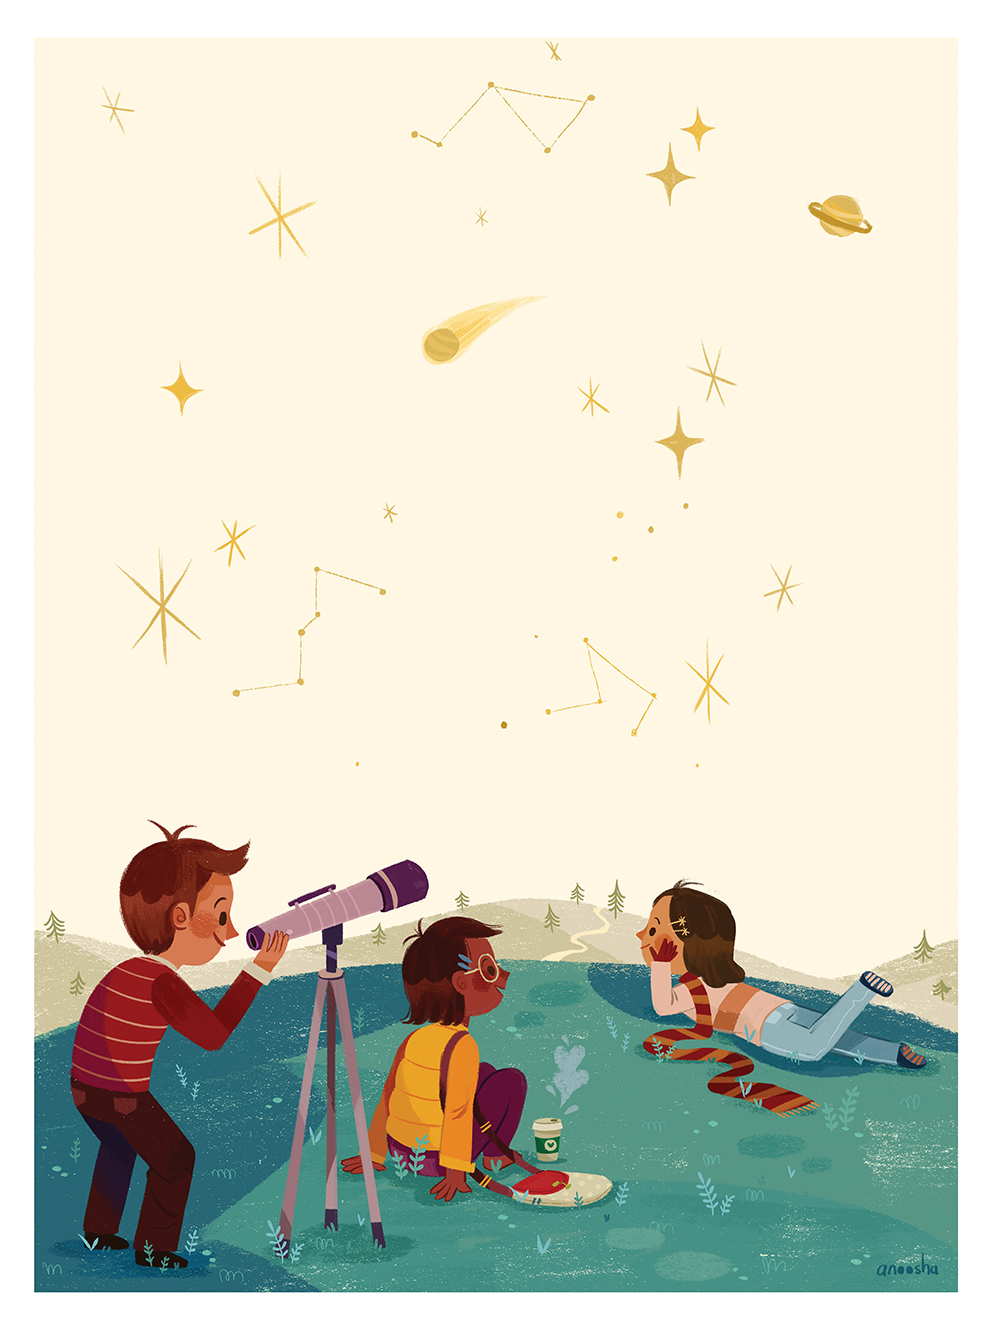 """Cosmic Latte"" by Anoosha Syed"